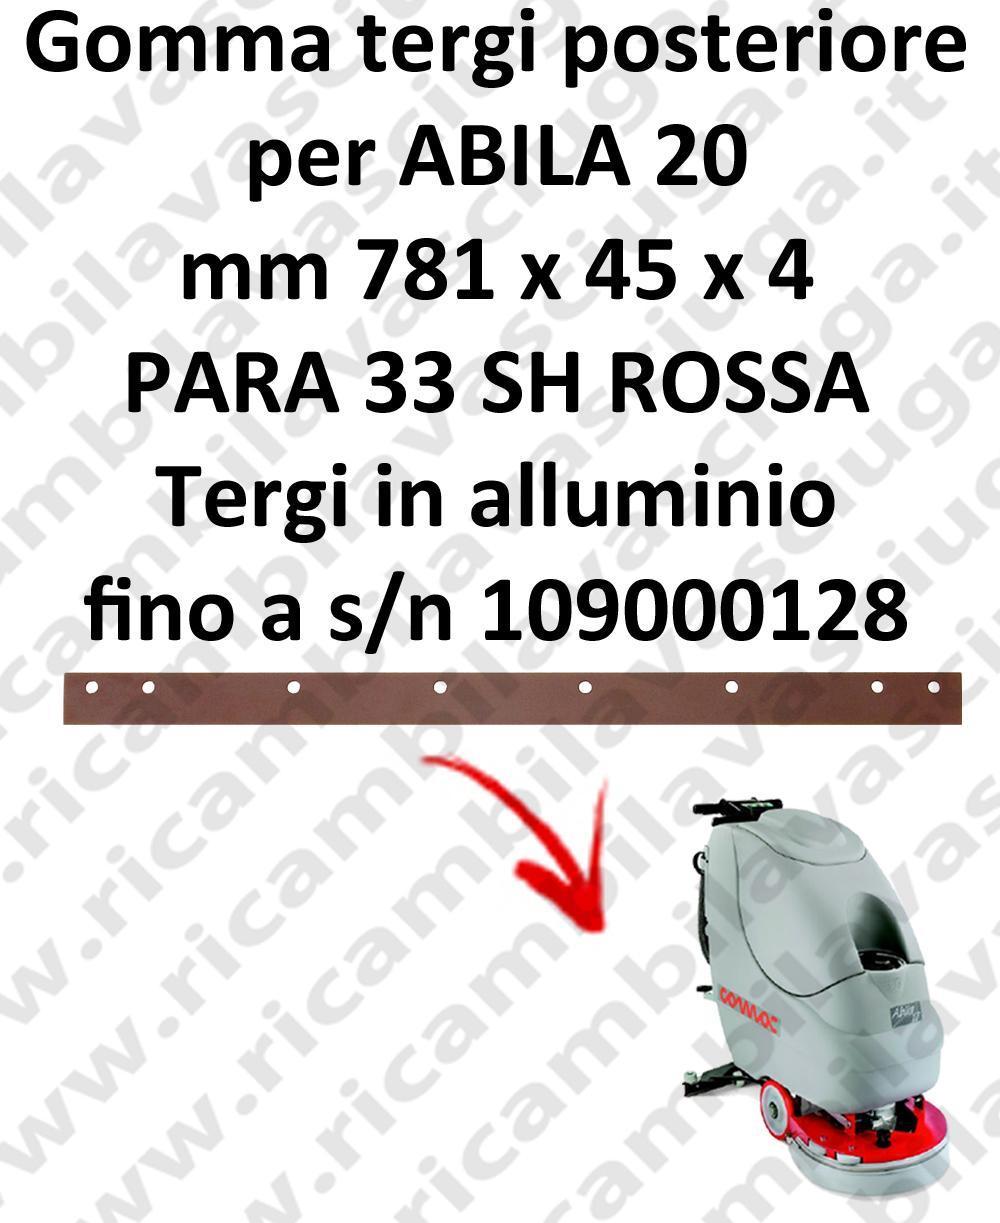 ABILA 20 fino a s/n 109000128 goma de secado trasero para COMAC repuestos fregadoras squeegee